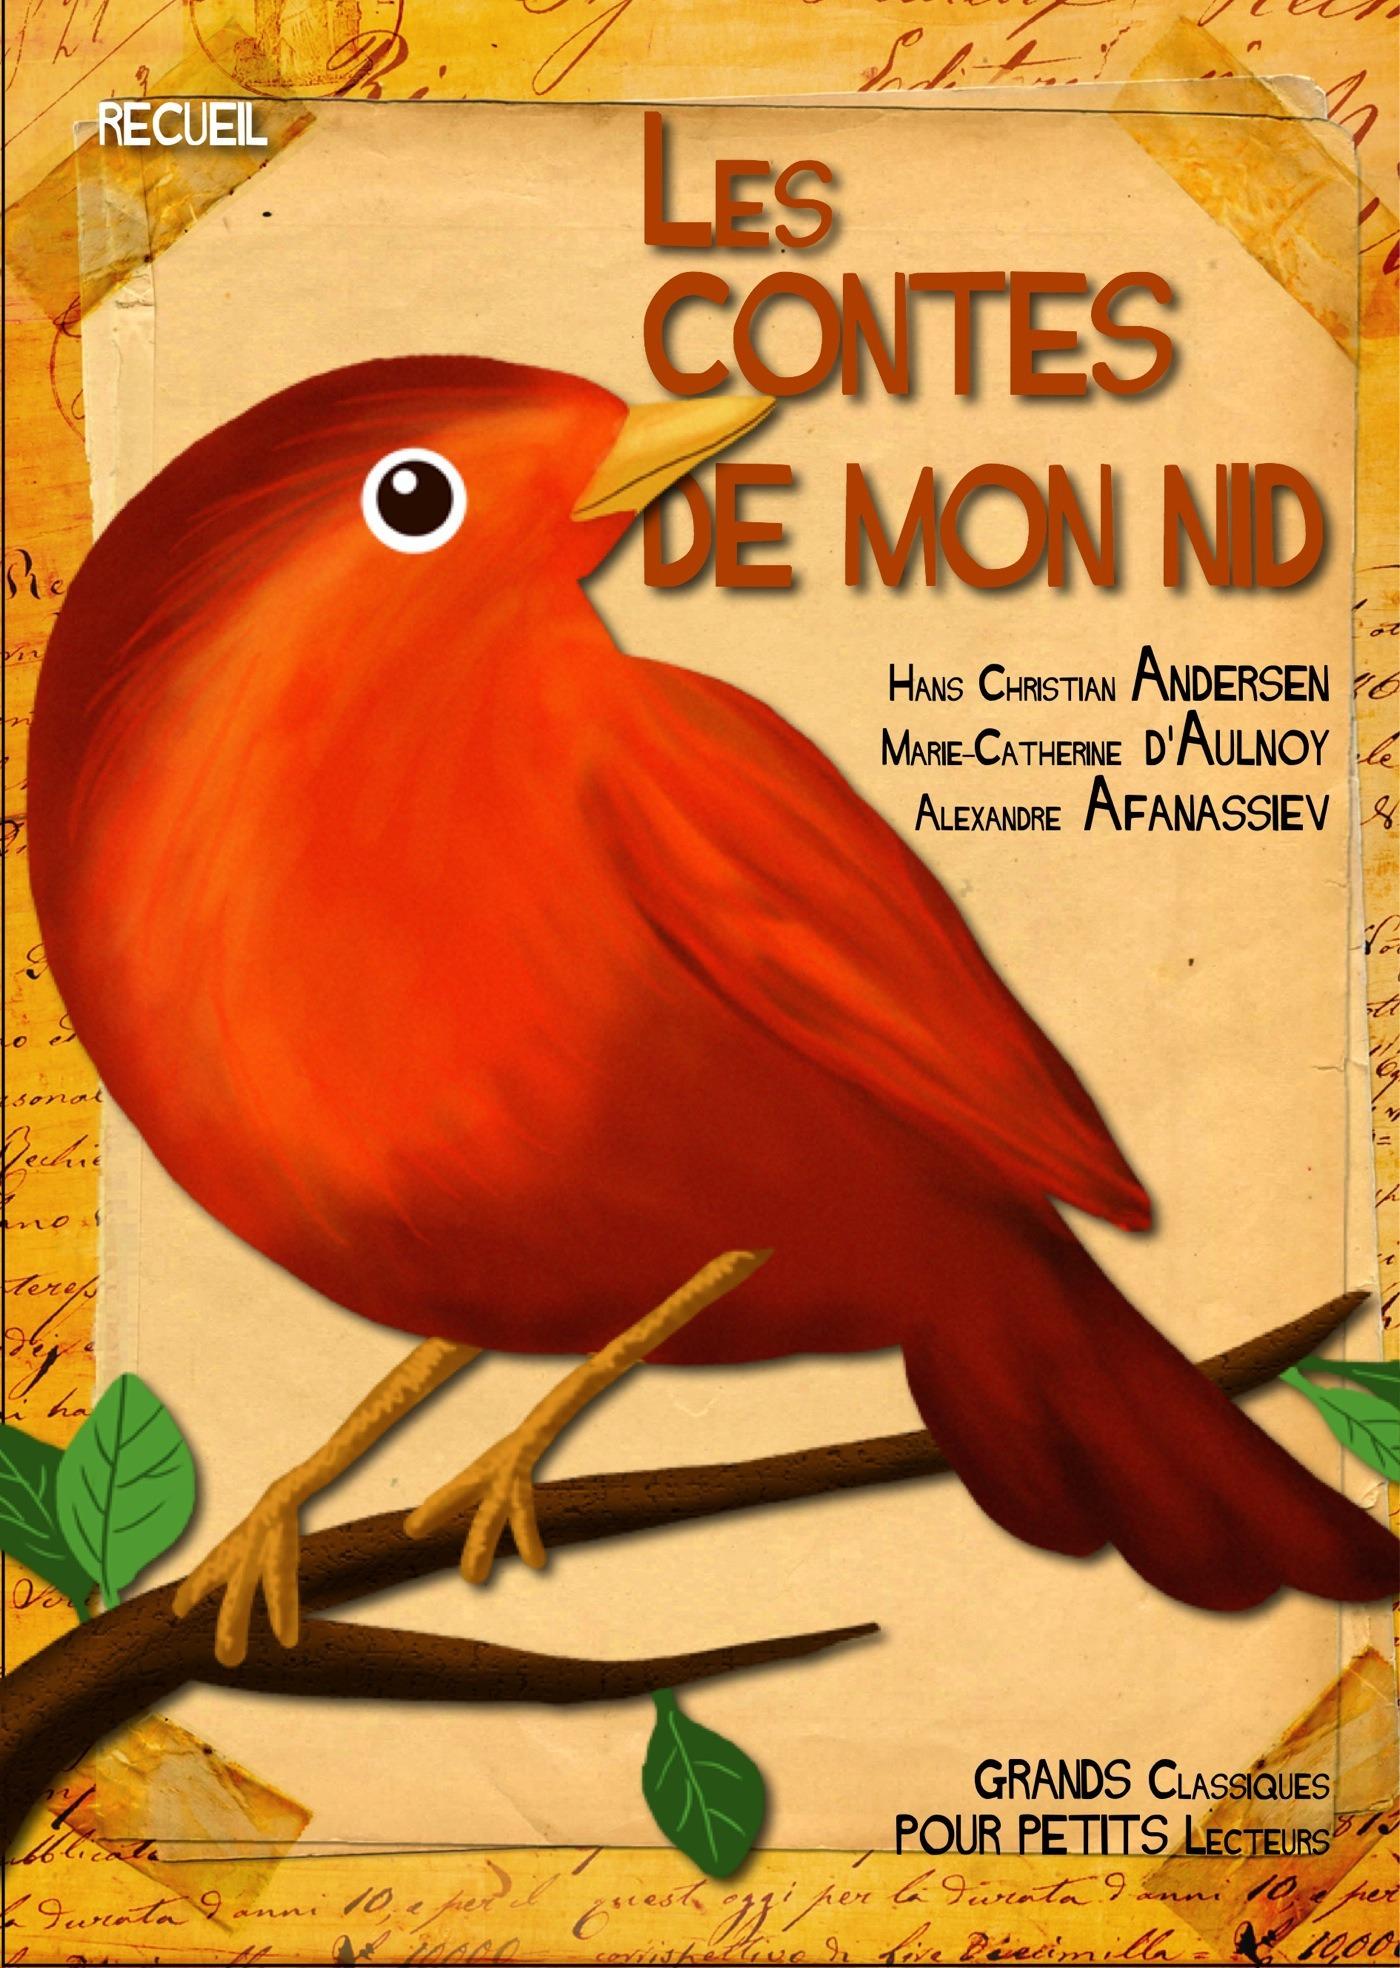 Hans Christian Andersen Les Contes de mon nid